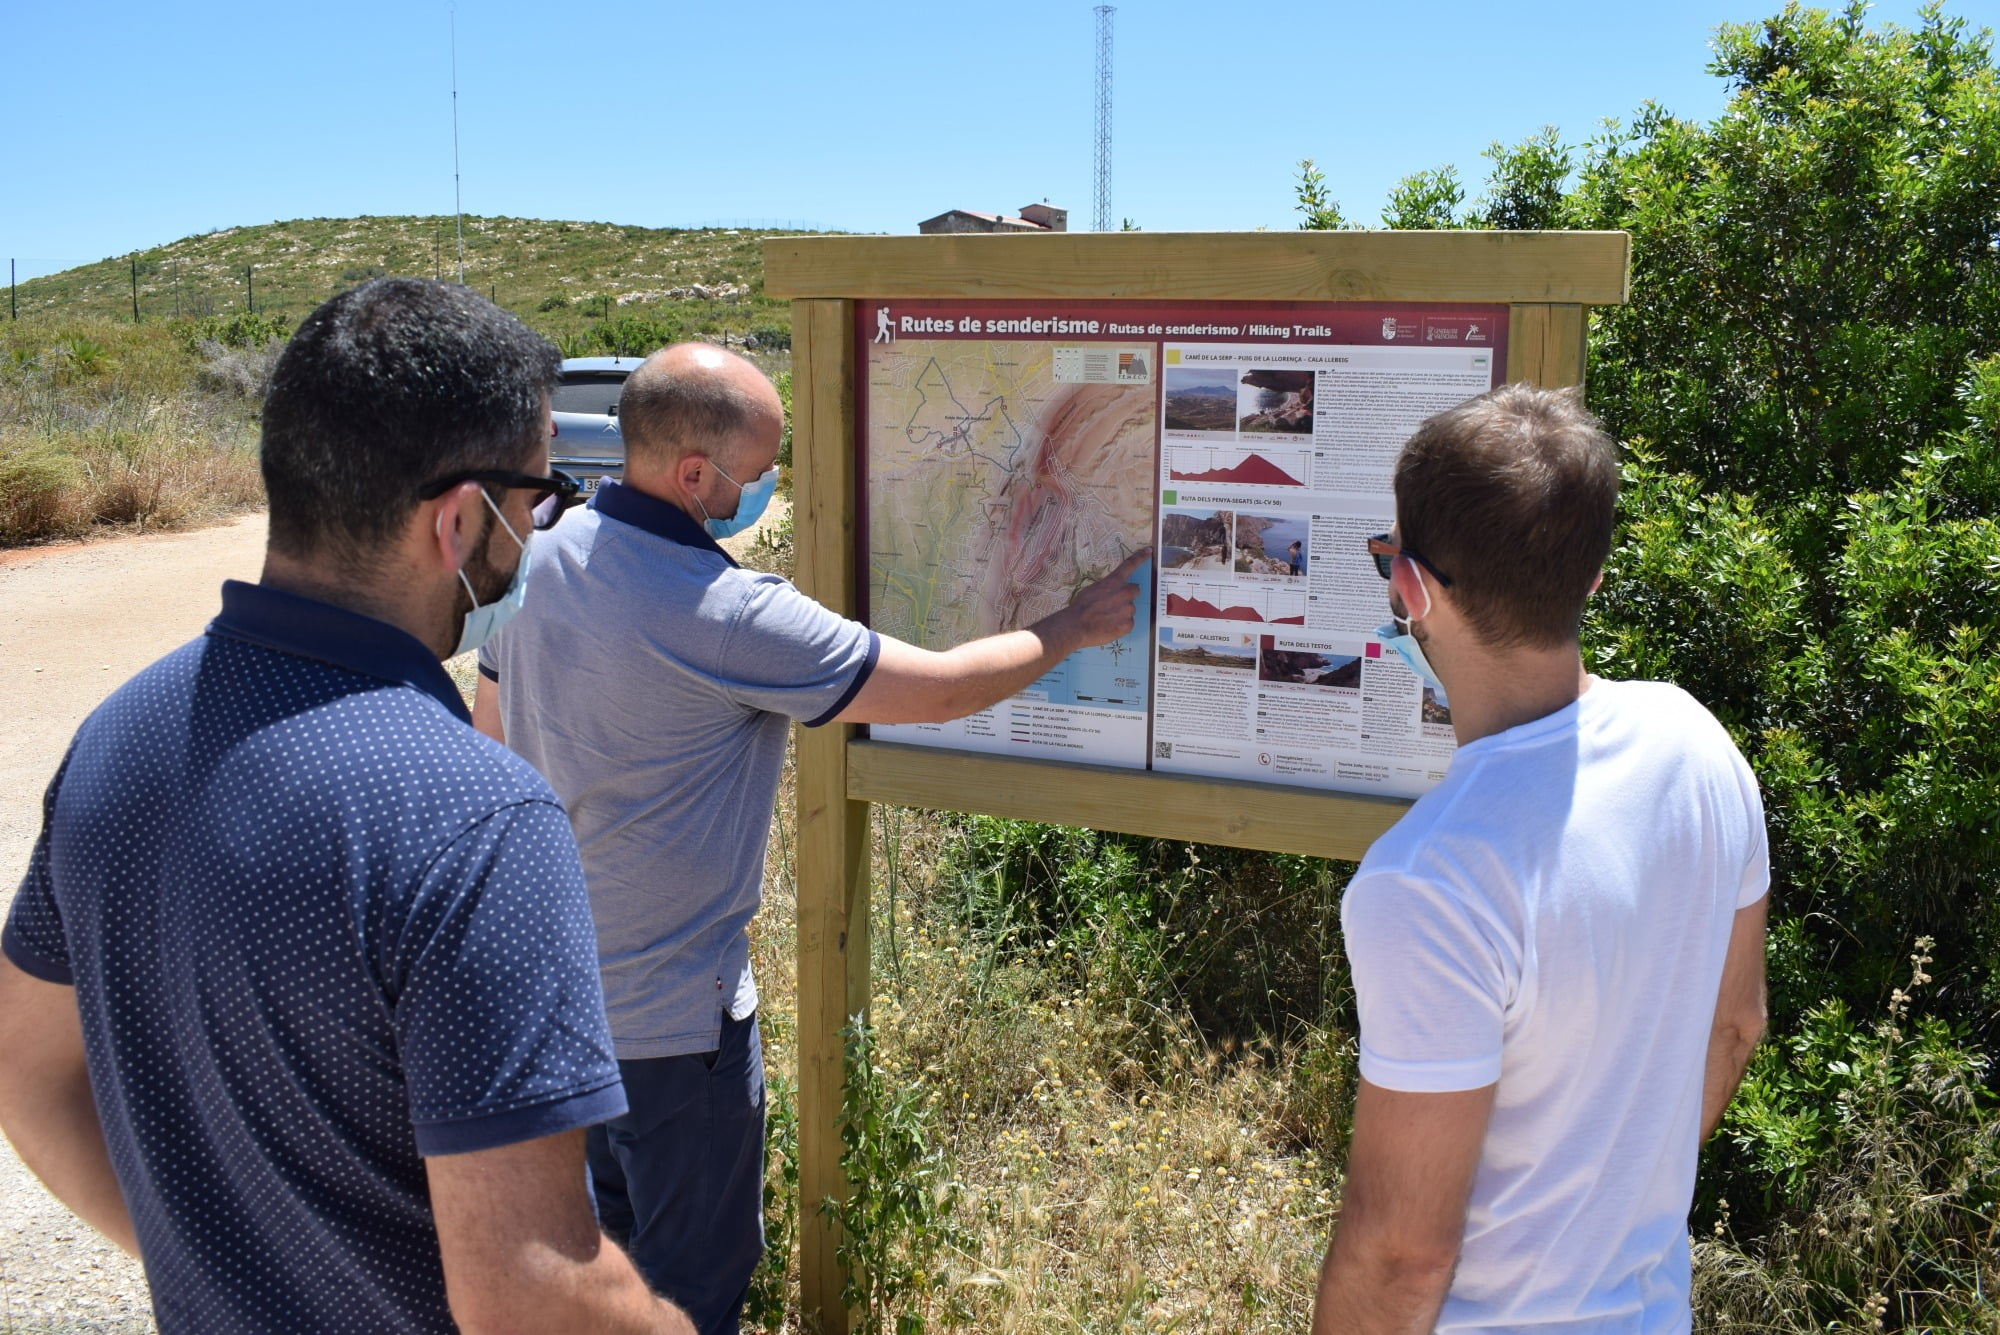 Nueva ruta senderista El Poble Nou de Benitatxell